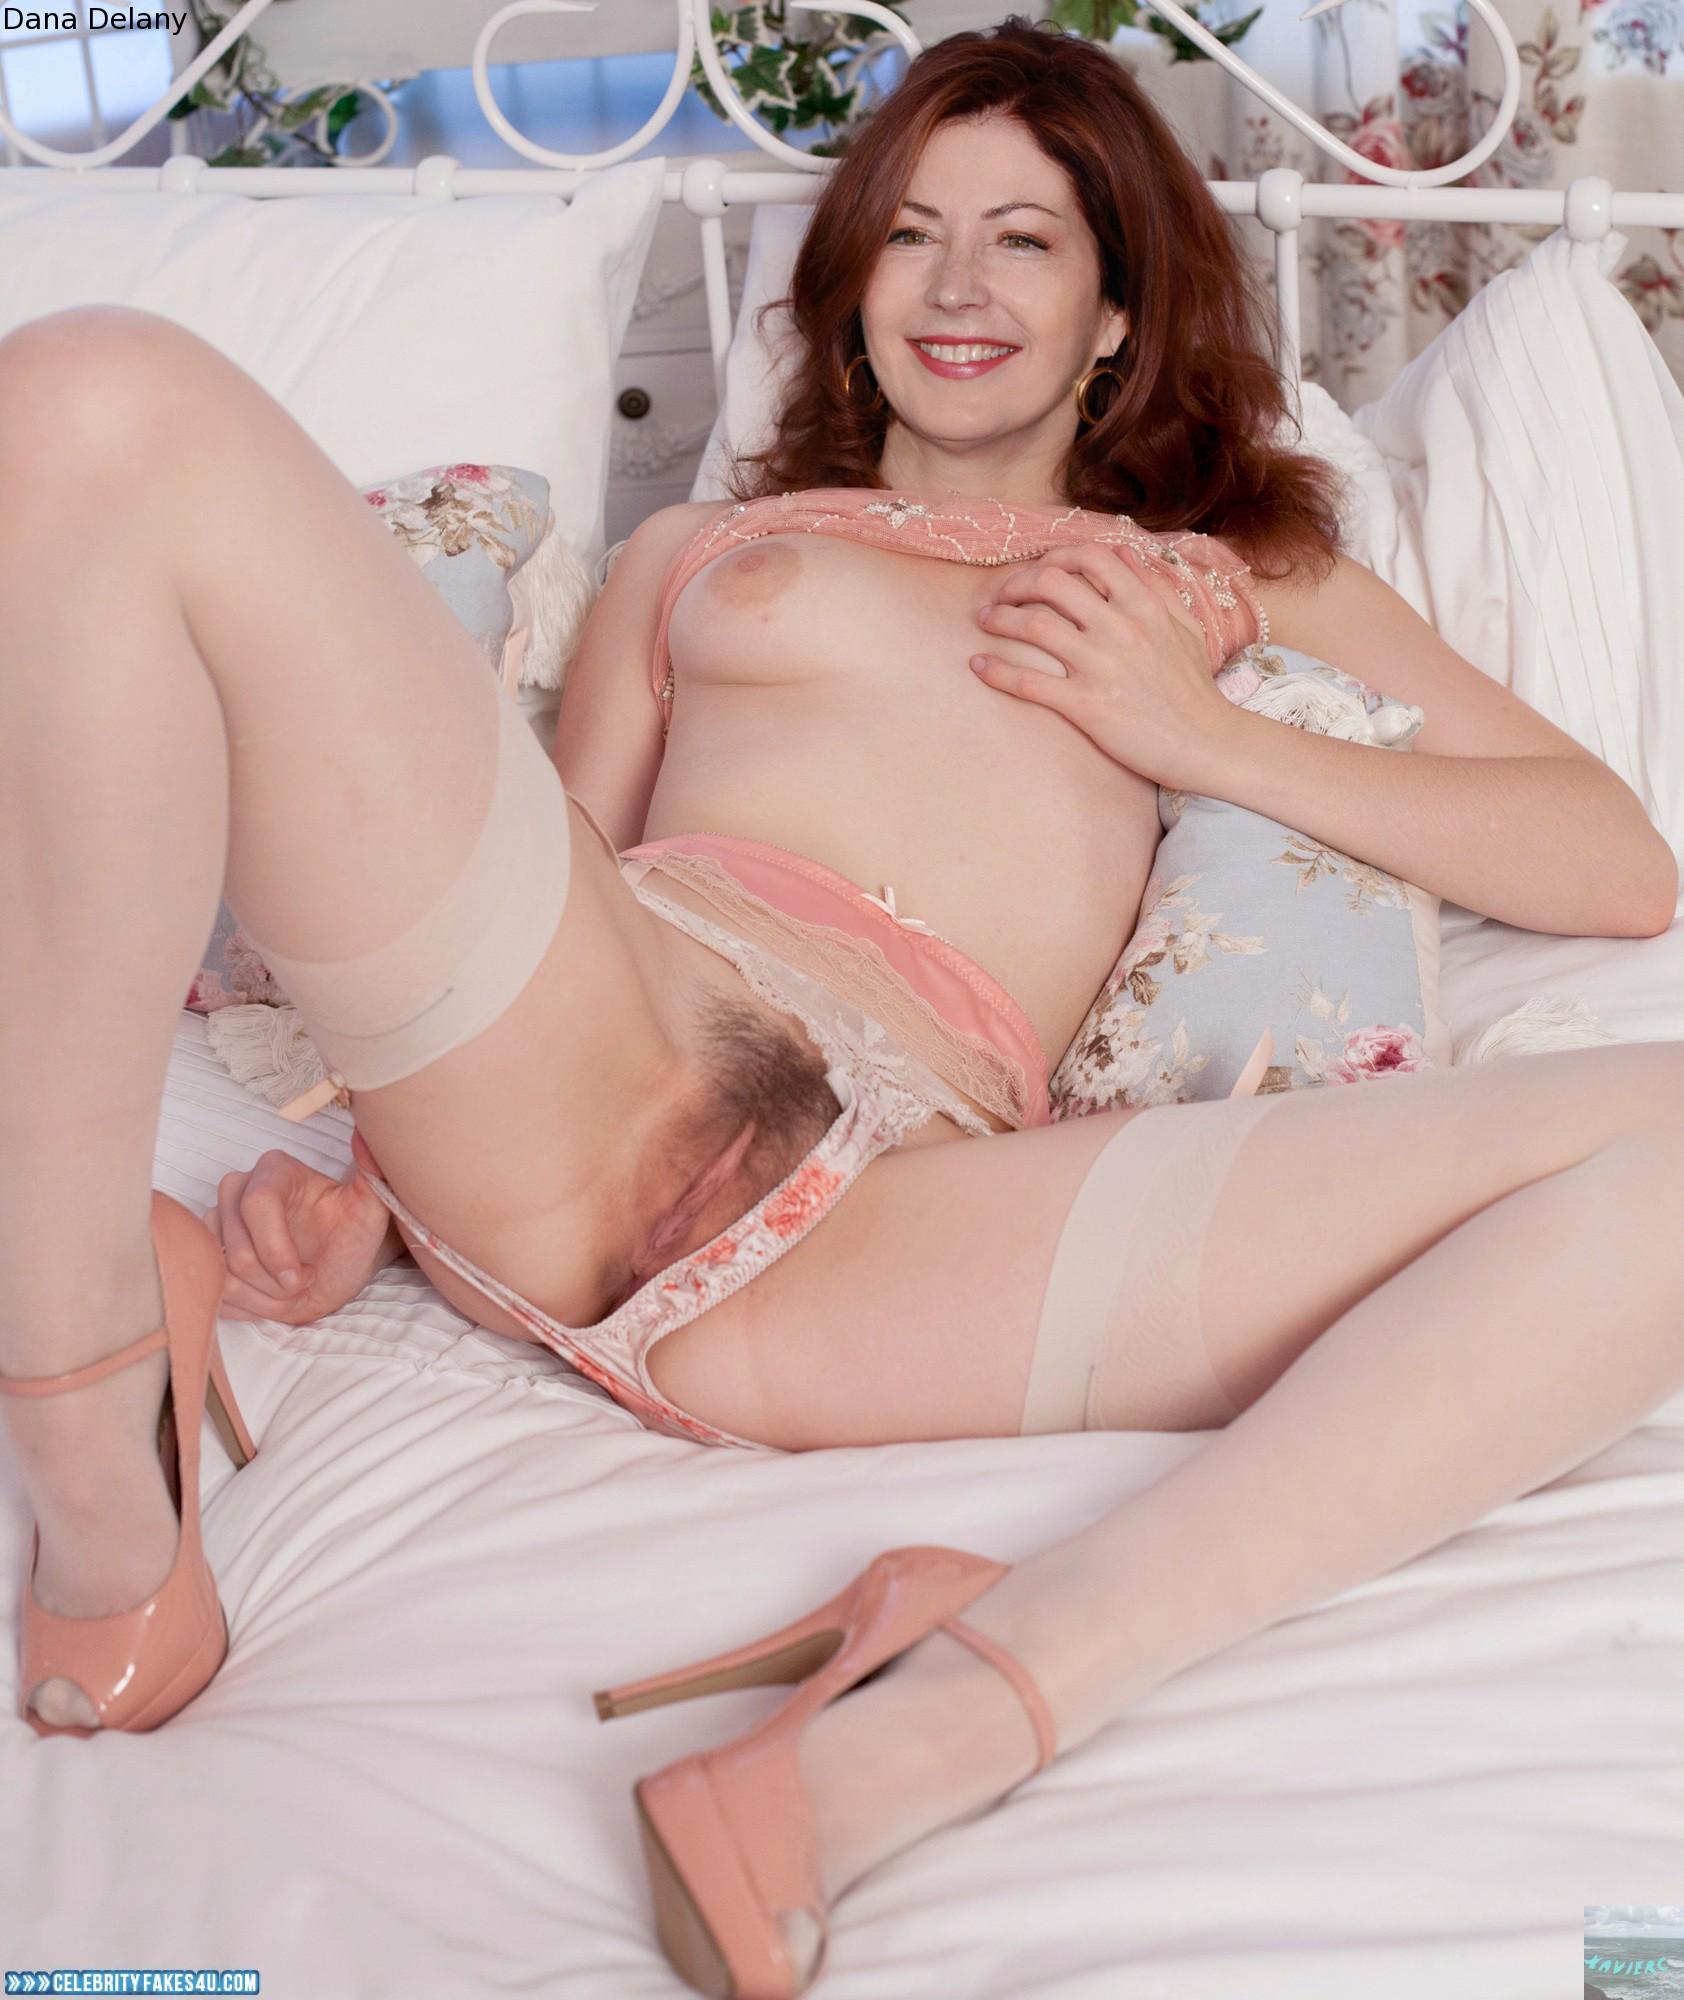 delaney porn star